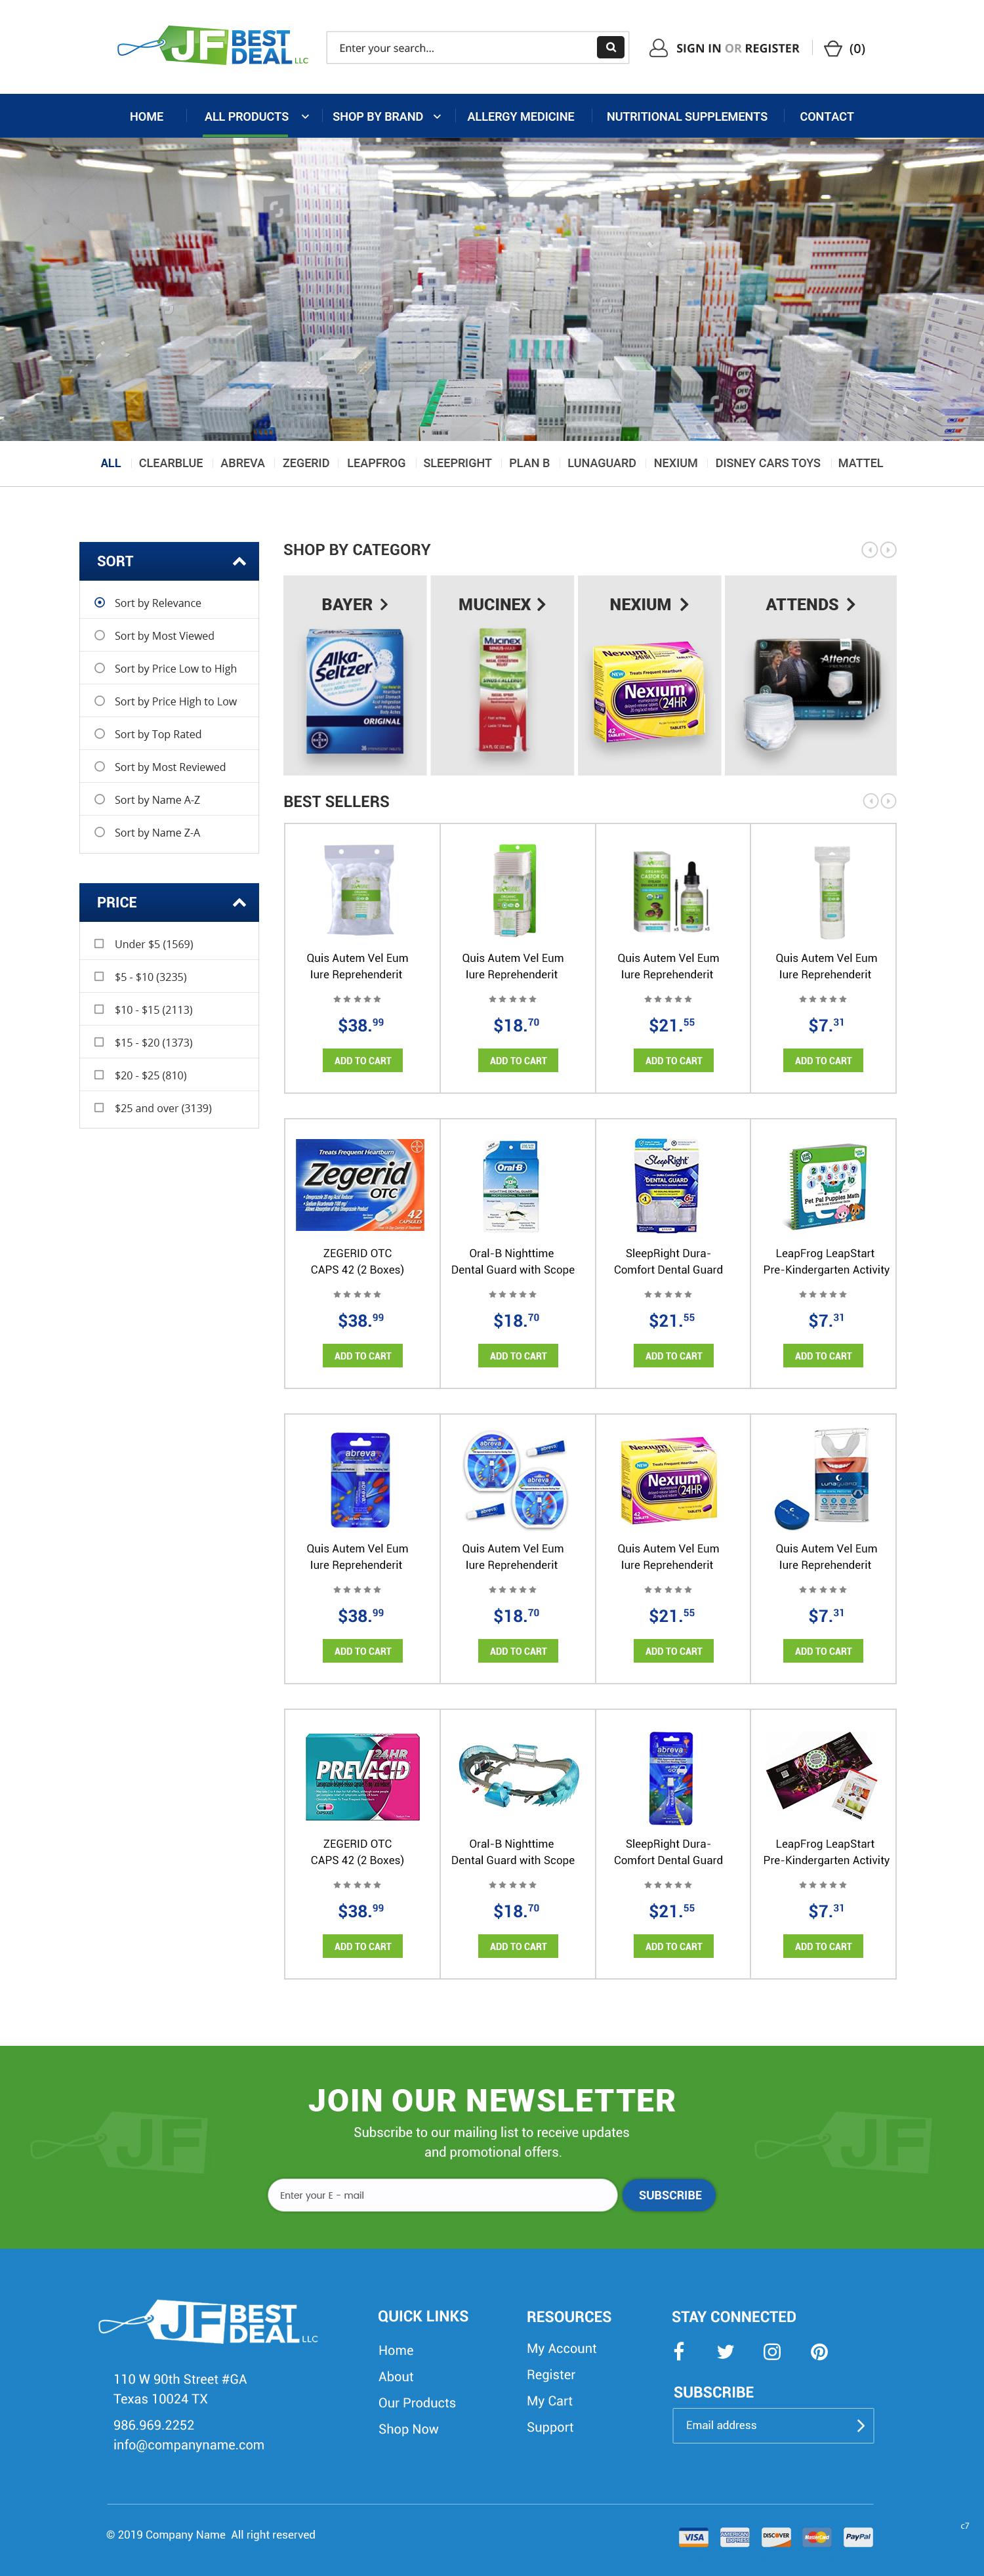 BigCommerce Design by pb for JF BestDeal LLC | Design: #22682412